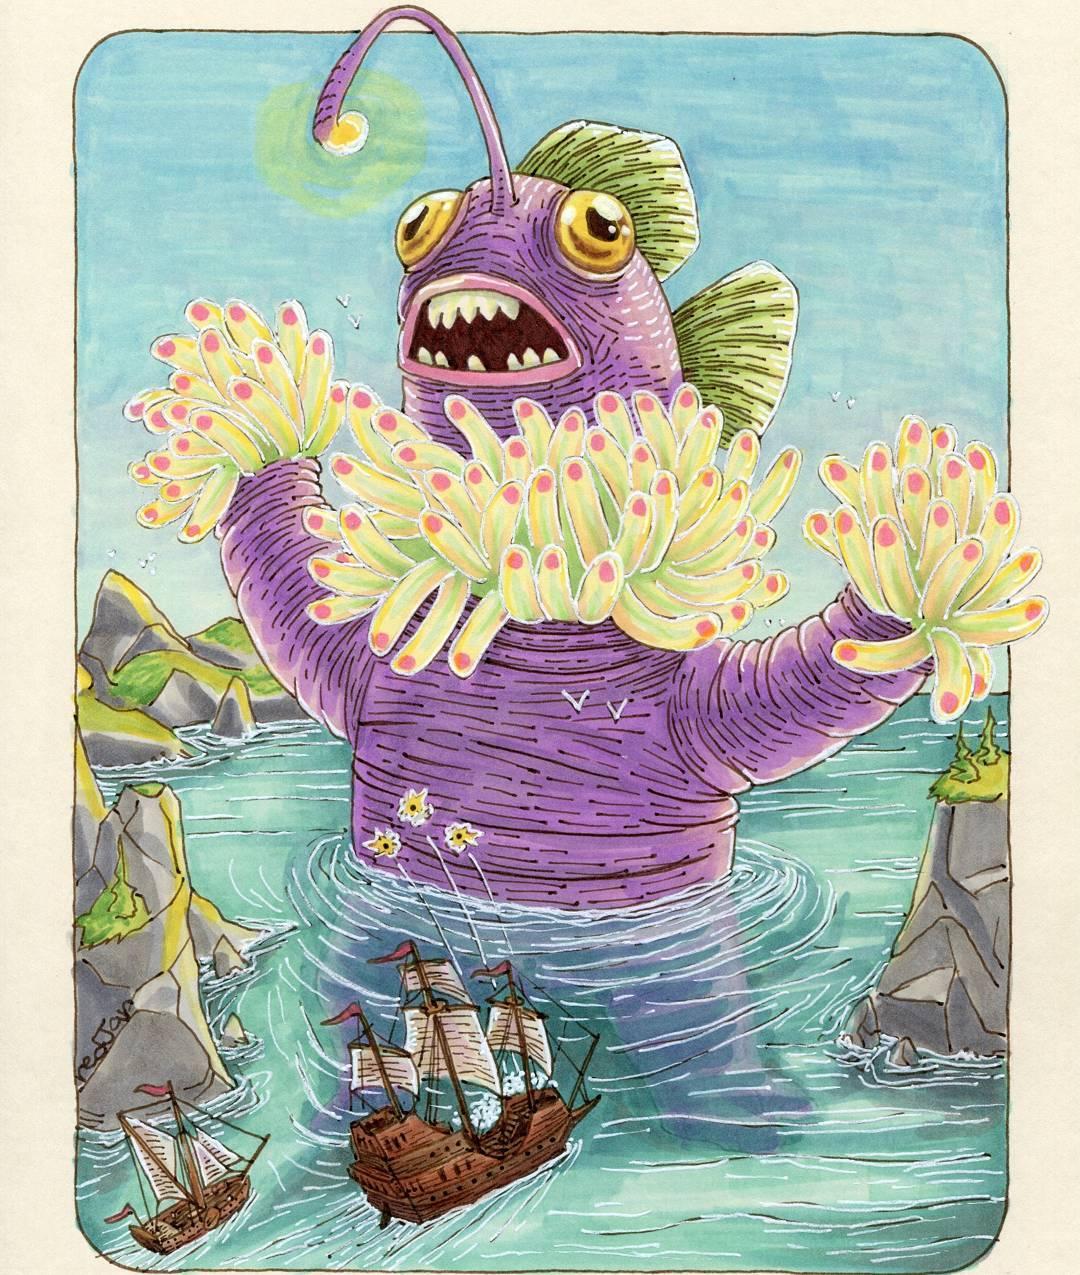 "redjarojam ""Anemone Monster"" - by Jared DeCosta (redjarojam) www.instagram.com/redjarojam (2016-2019) © dell'autore tutti i diritti riservati"